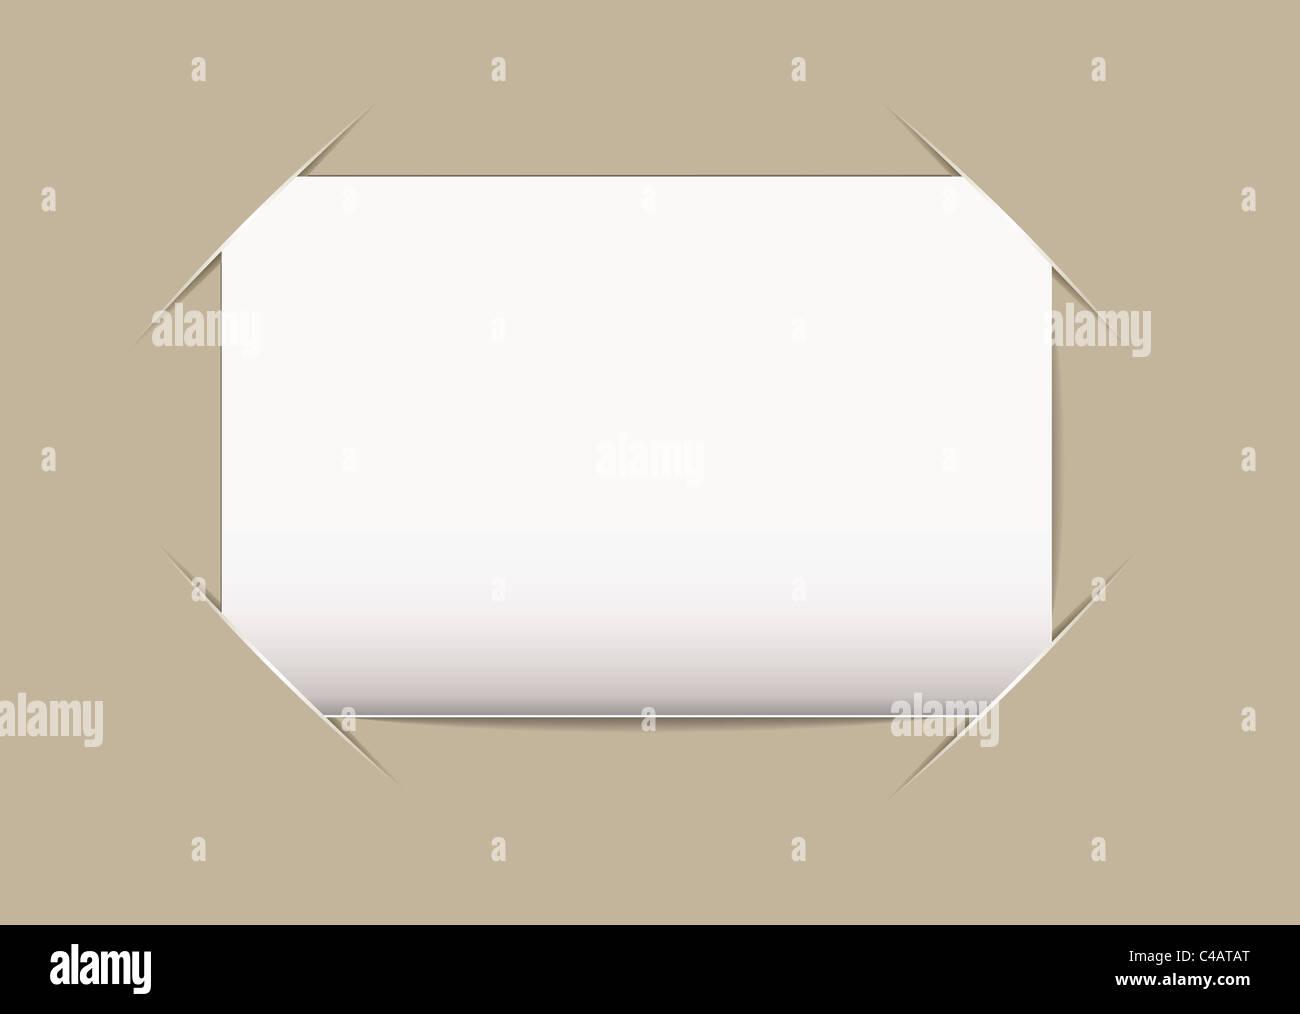 Plain blank business card stuck on beige card background Stock ...